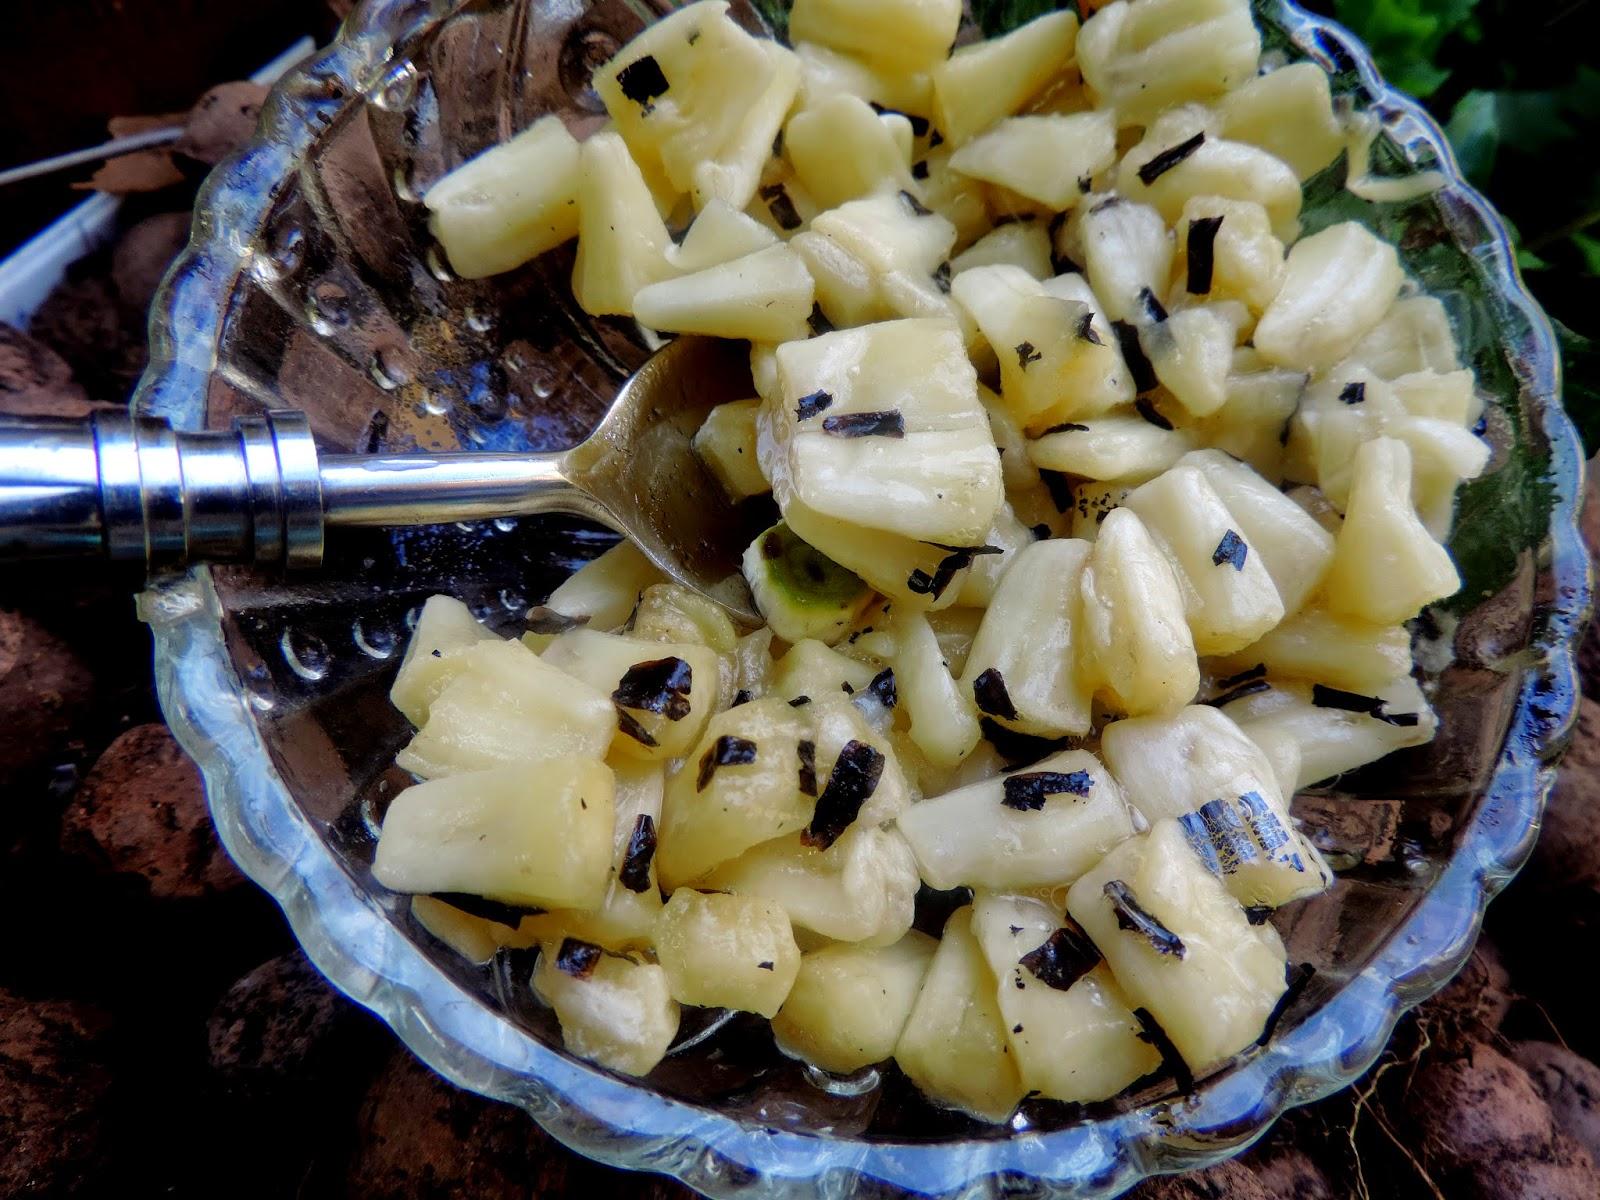 Fruta da costela-de-adão Monstera deliciosa